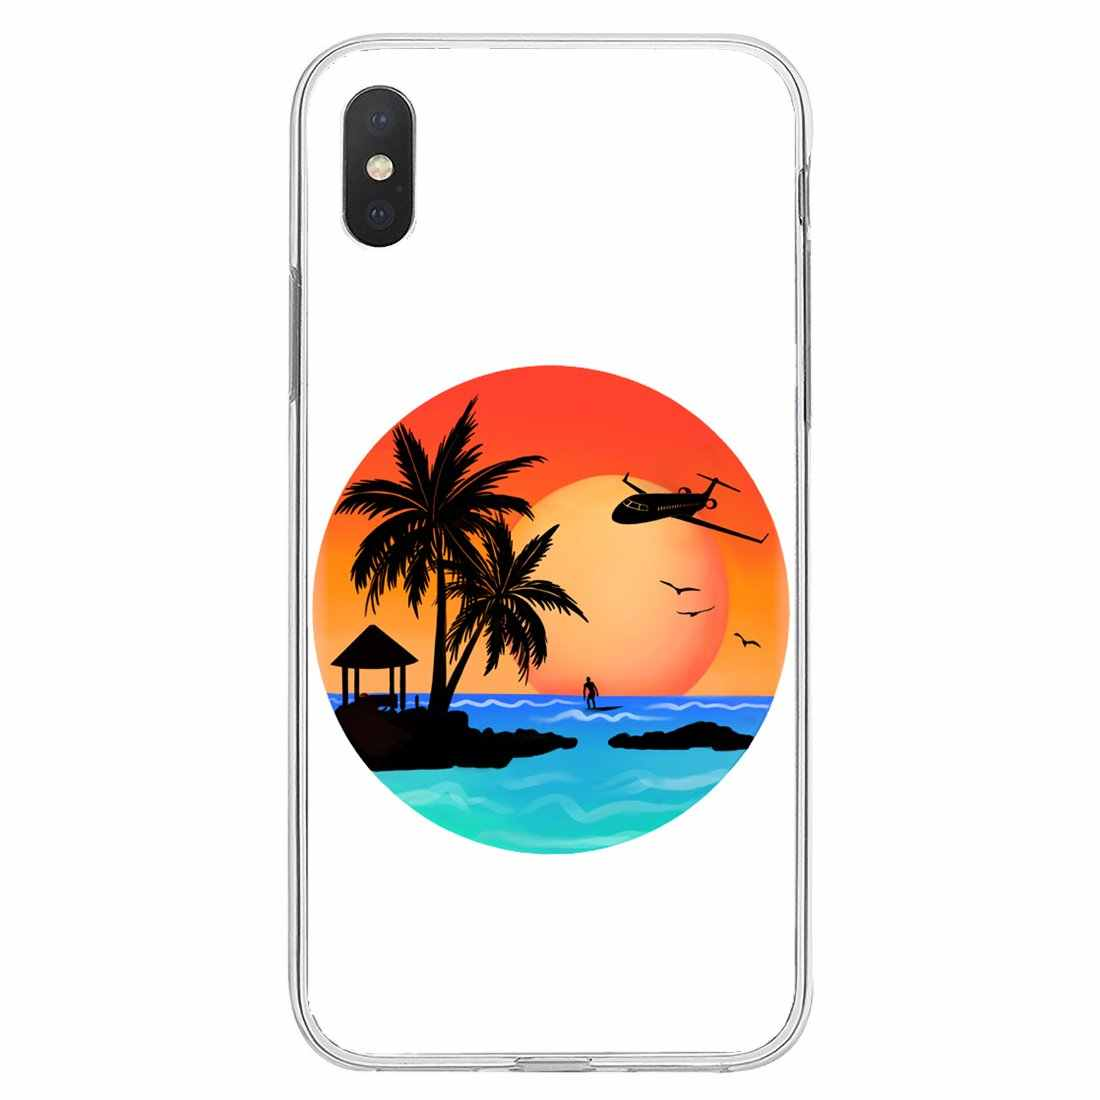 Surfboard Surfing sunset Surfer girl Incredible Silicone Phone Case For Xiaomi Mi3 Mi4 Mi4i Mi4C Redmi Note 2 3 3S Pro 5 Note 5A